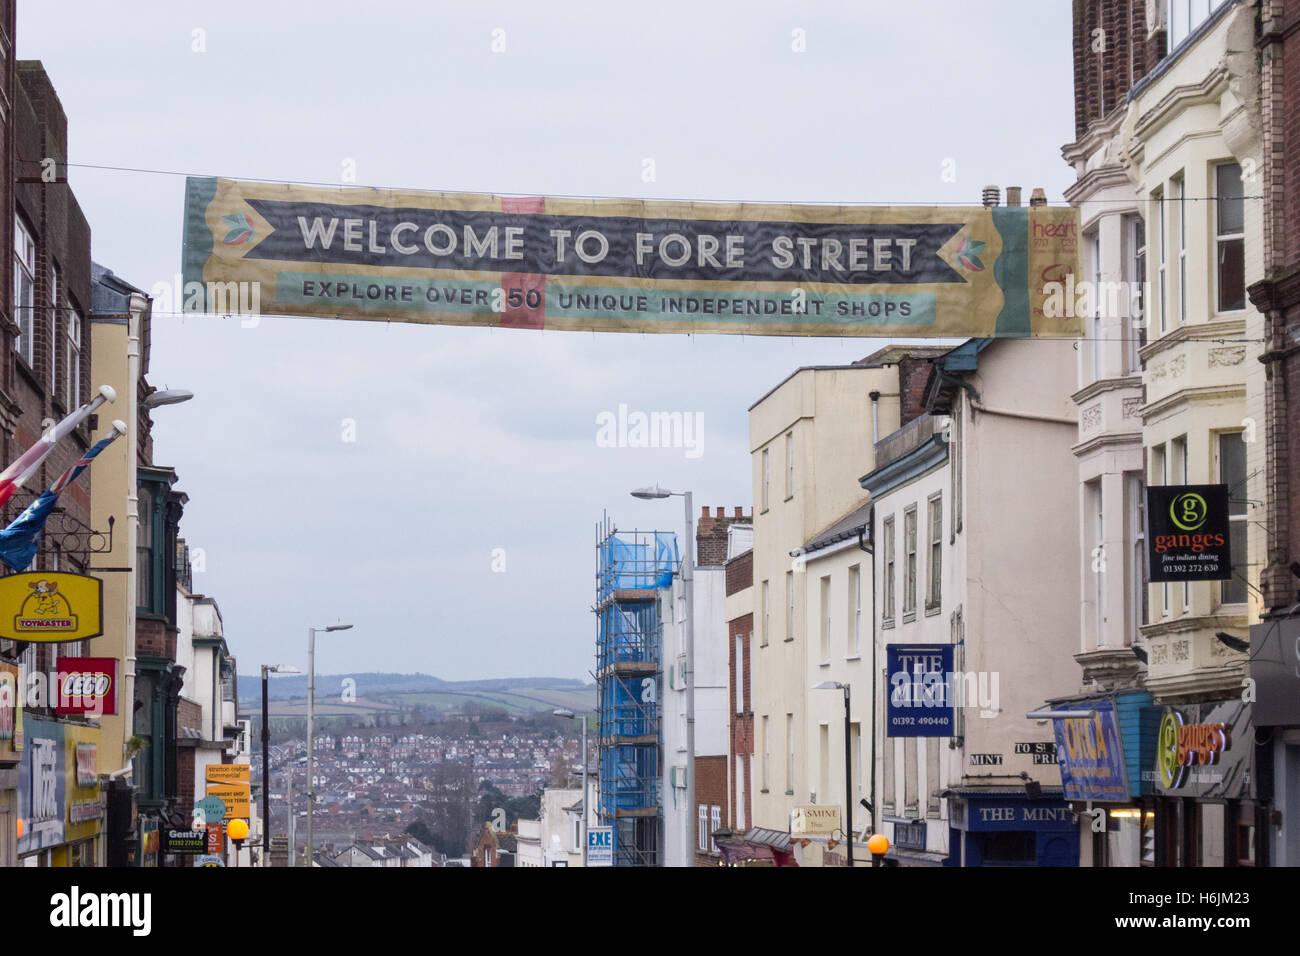 Independent shops on Fore Street, Exeter, Devon, England, UK - Stock Image